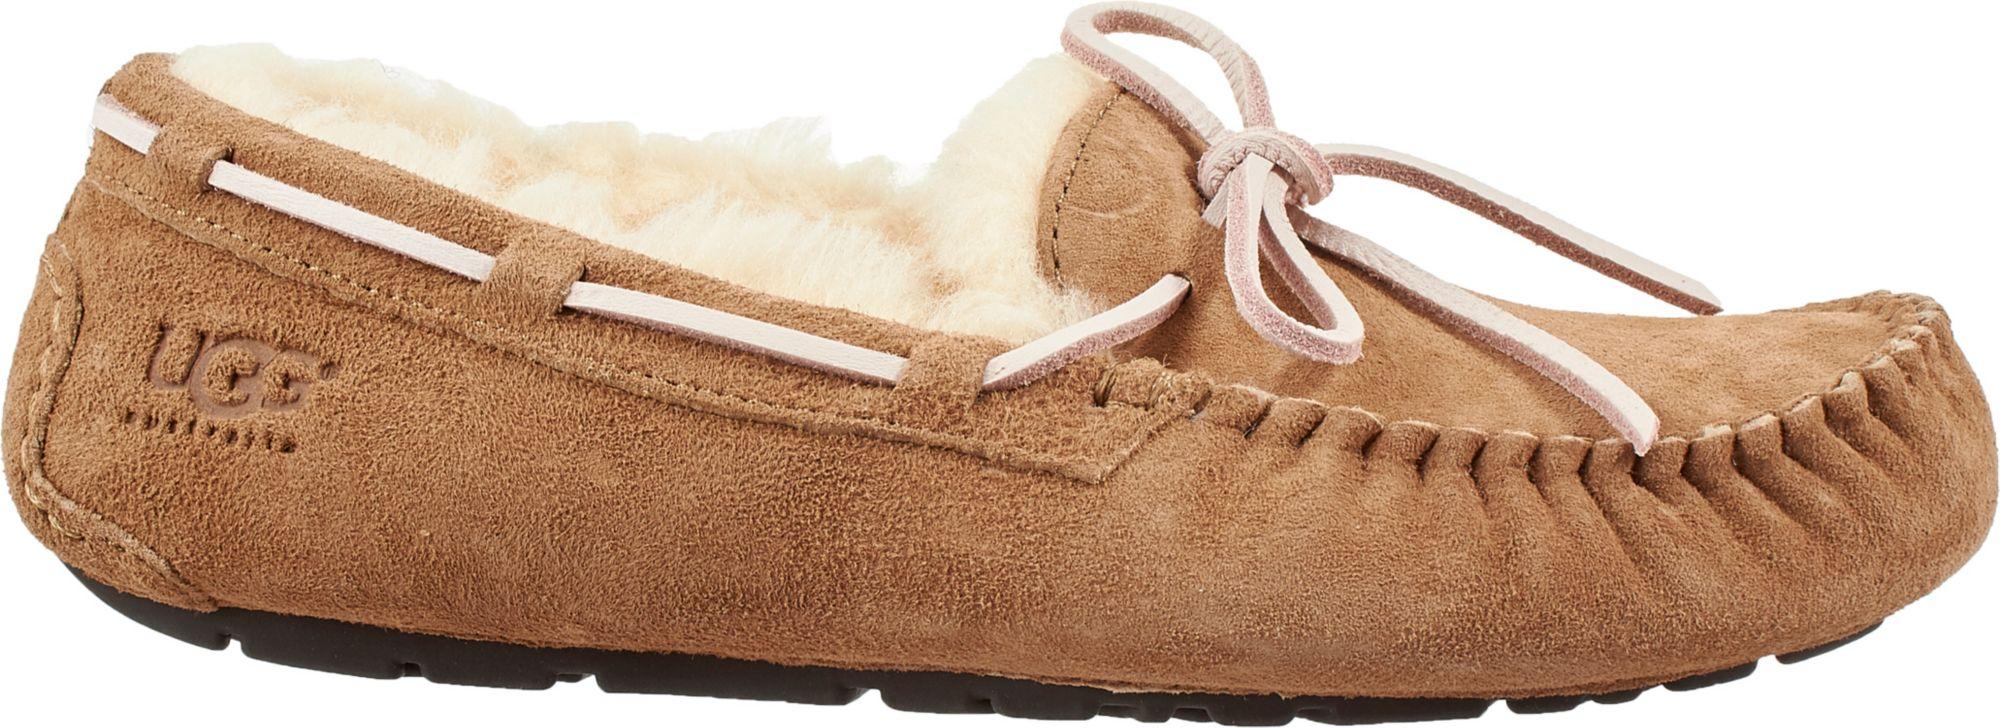 Ugg Dakota Slippers